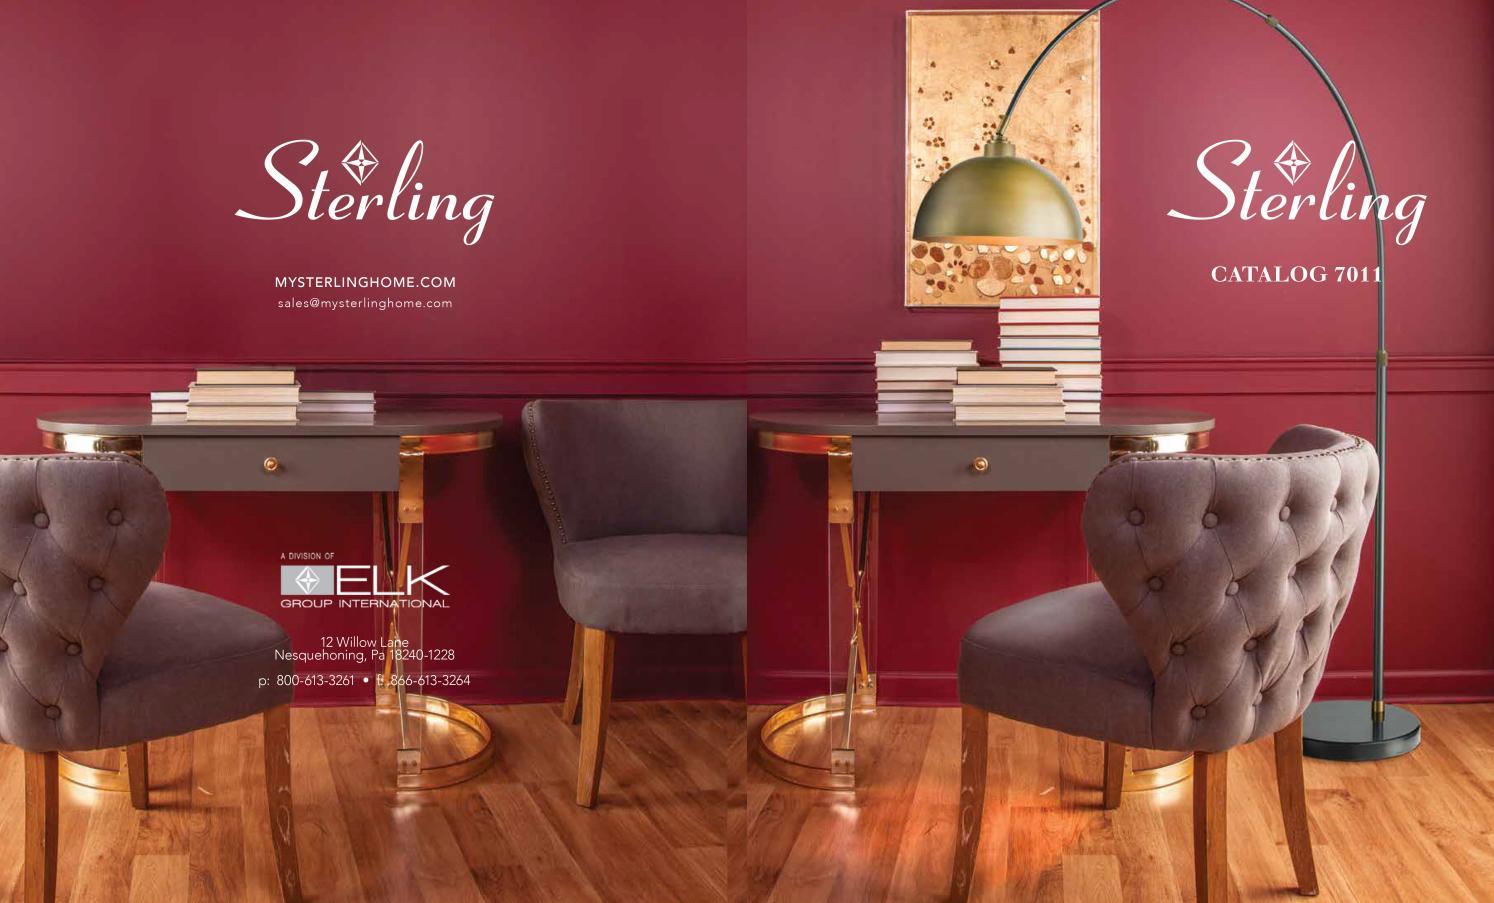 Tremendous Sterling Catalog 7011 By Tnspi Home Issuu Inzonedesignstudio Interior Chair Design Inzonedesignstudiocom